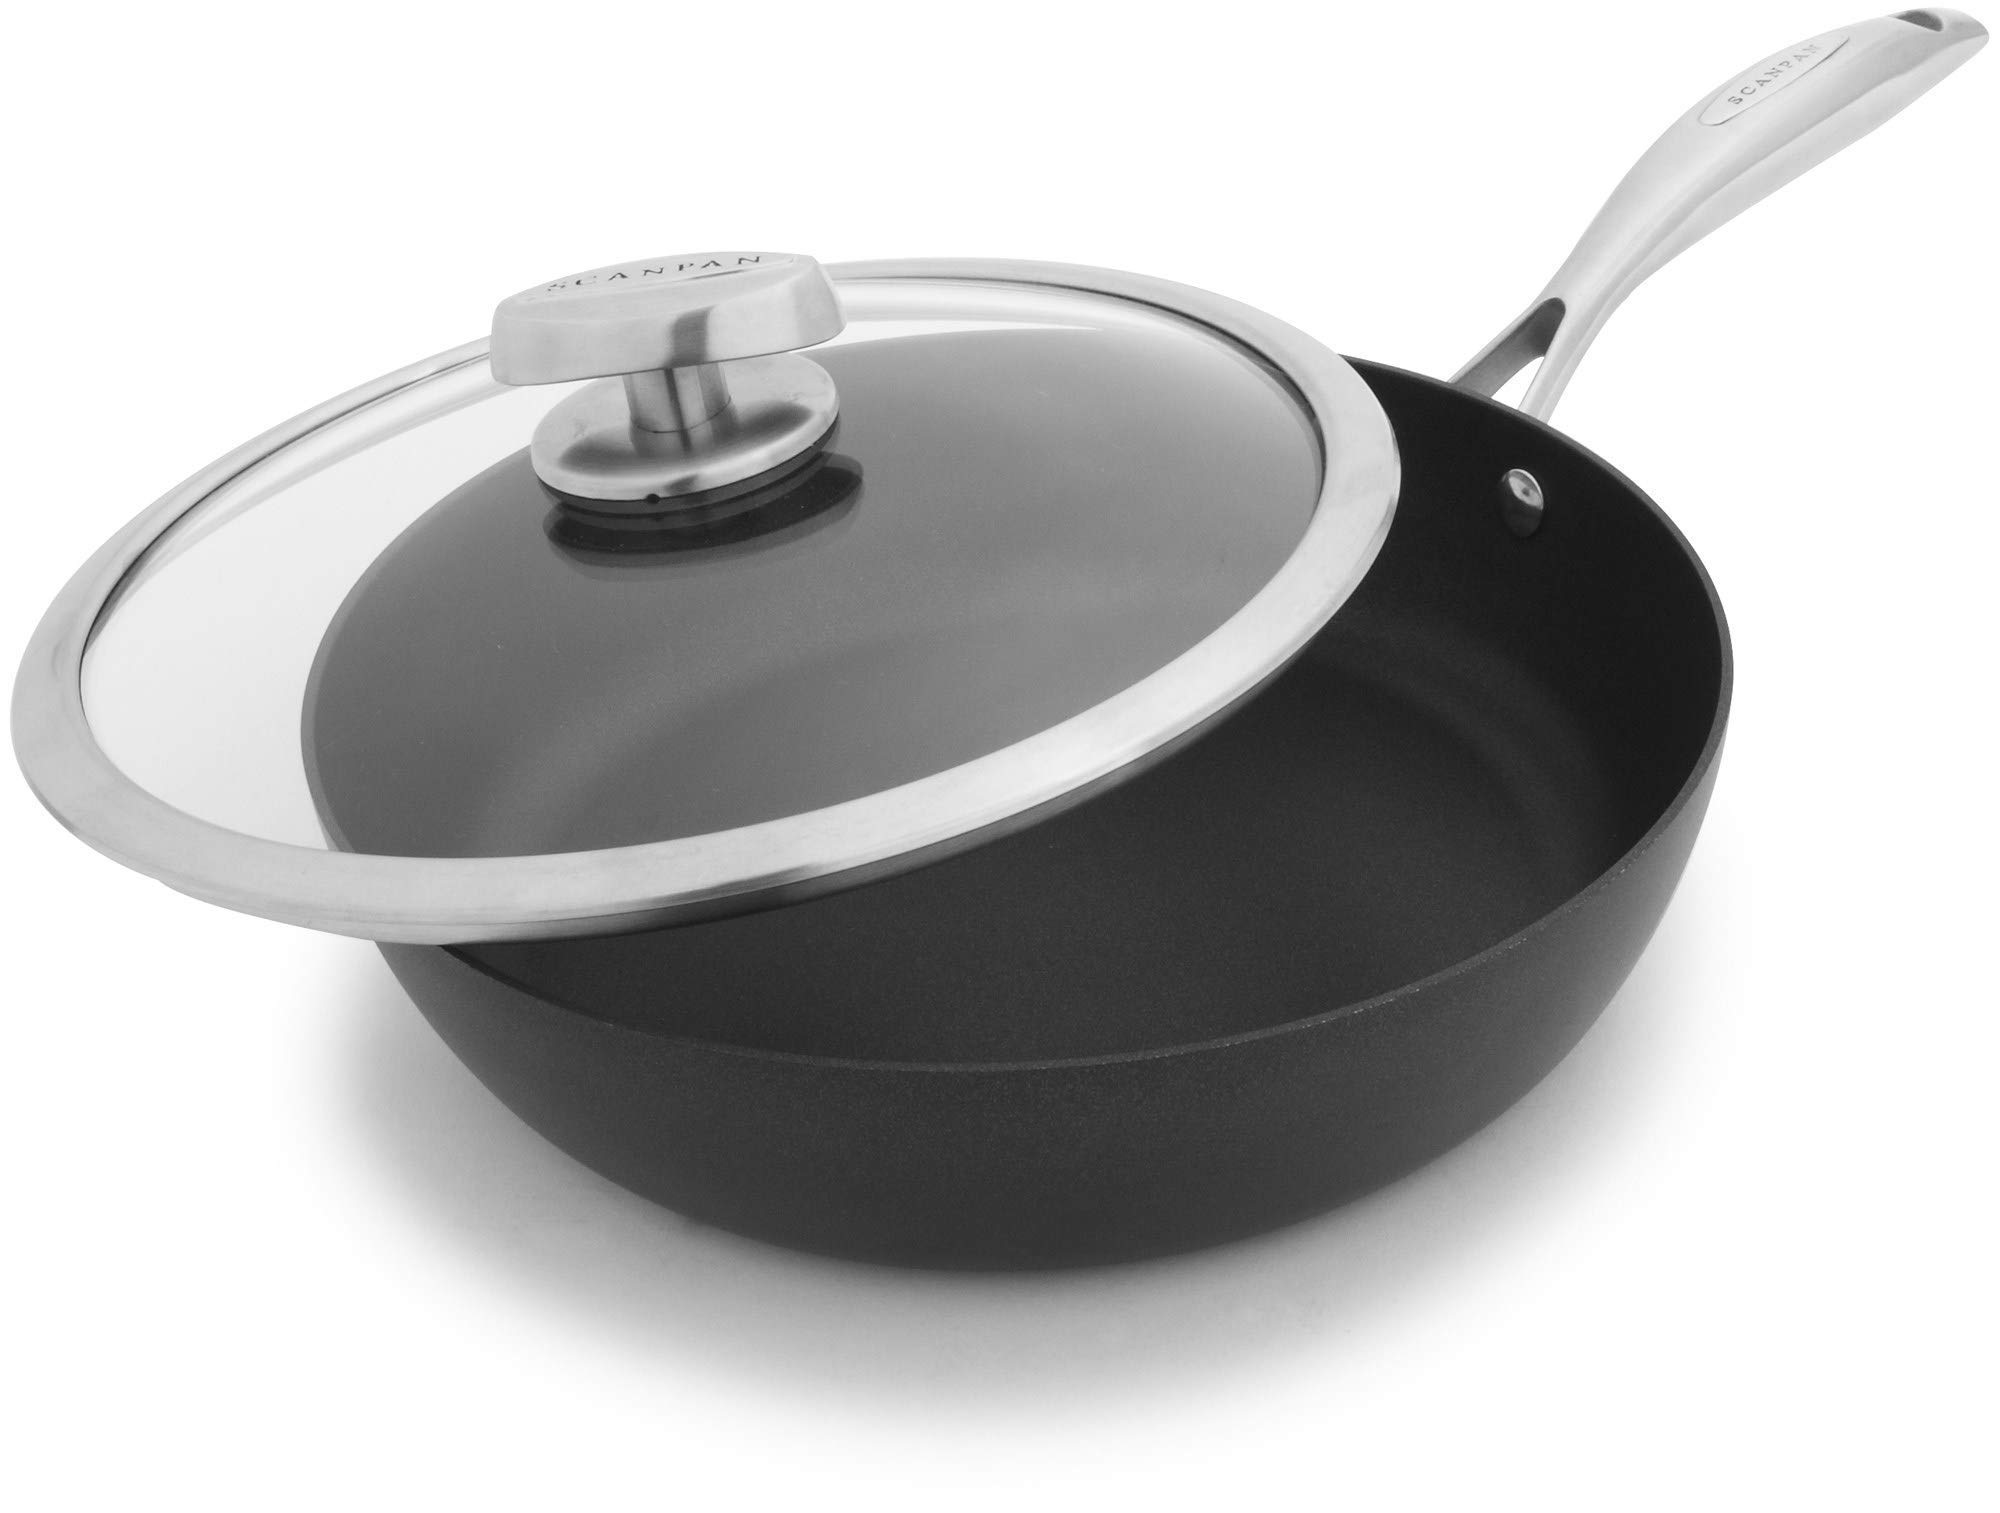 Scanpan PRO IQ Nonstick Covered Saute Pan, 2.75 quart, Black by Scanpan (Image #1)